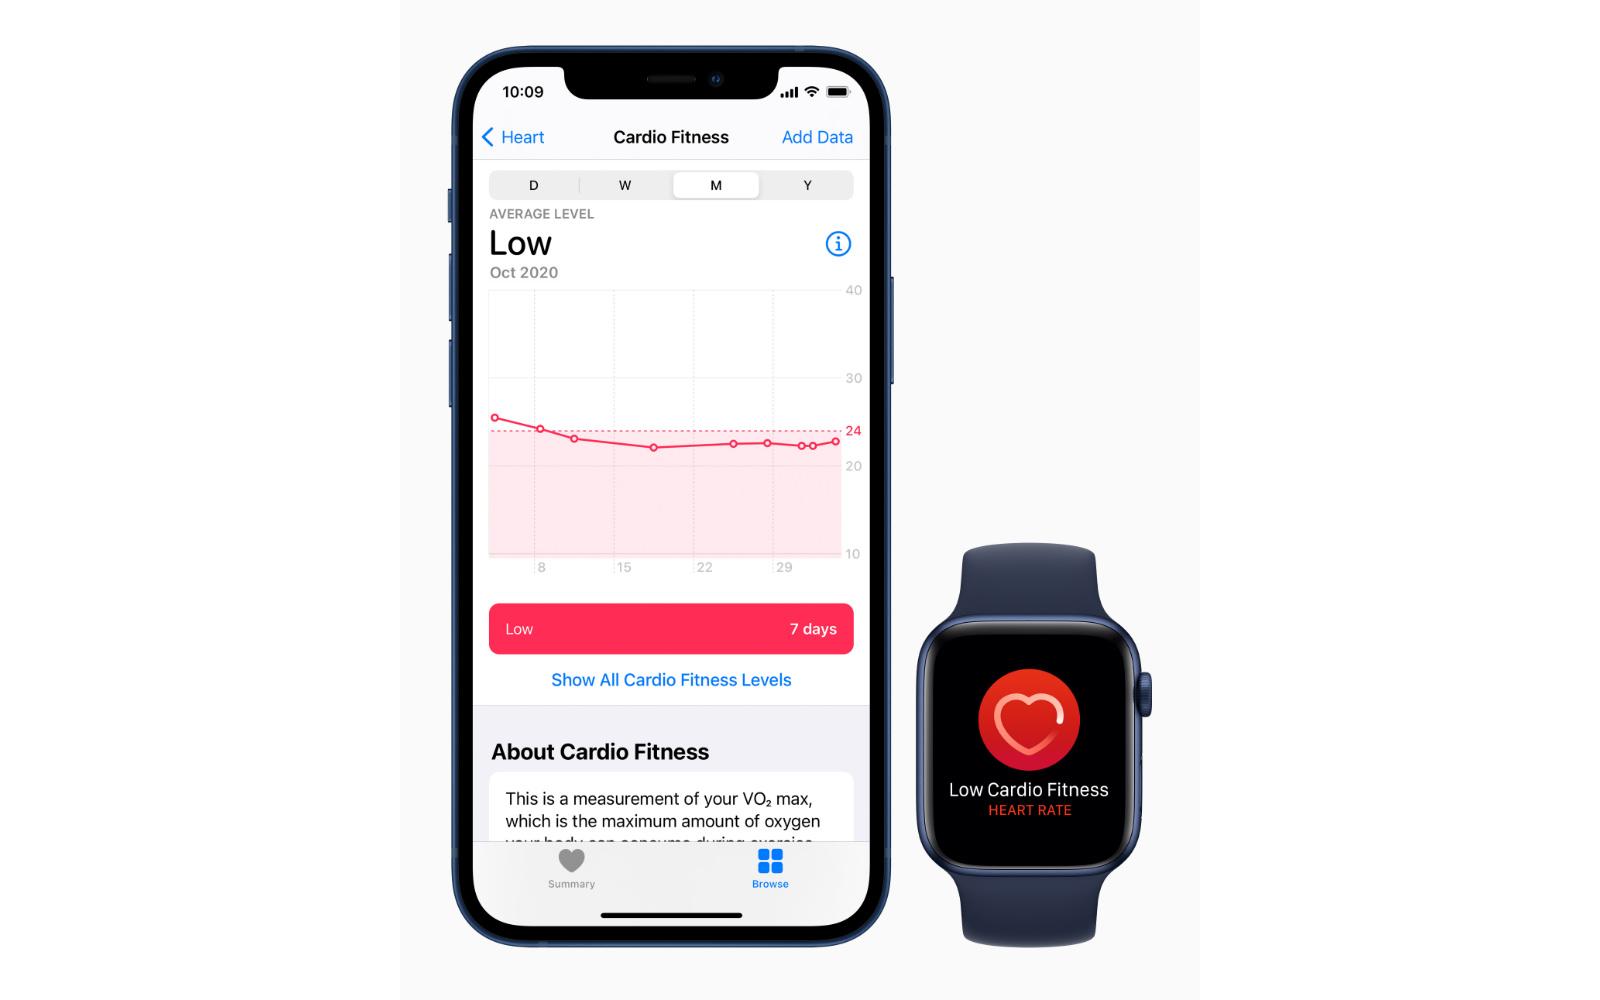 Apple iphone12 health cardiofitness high 12142020